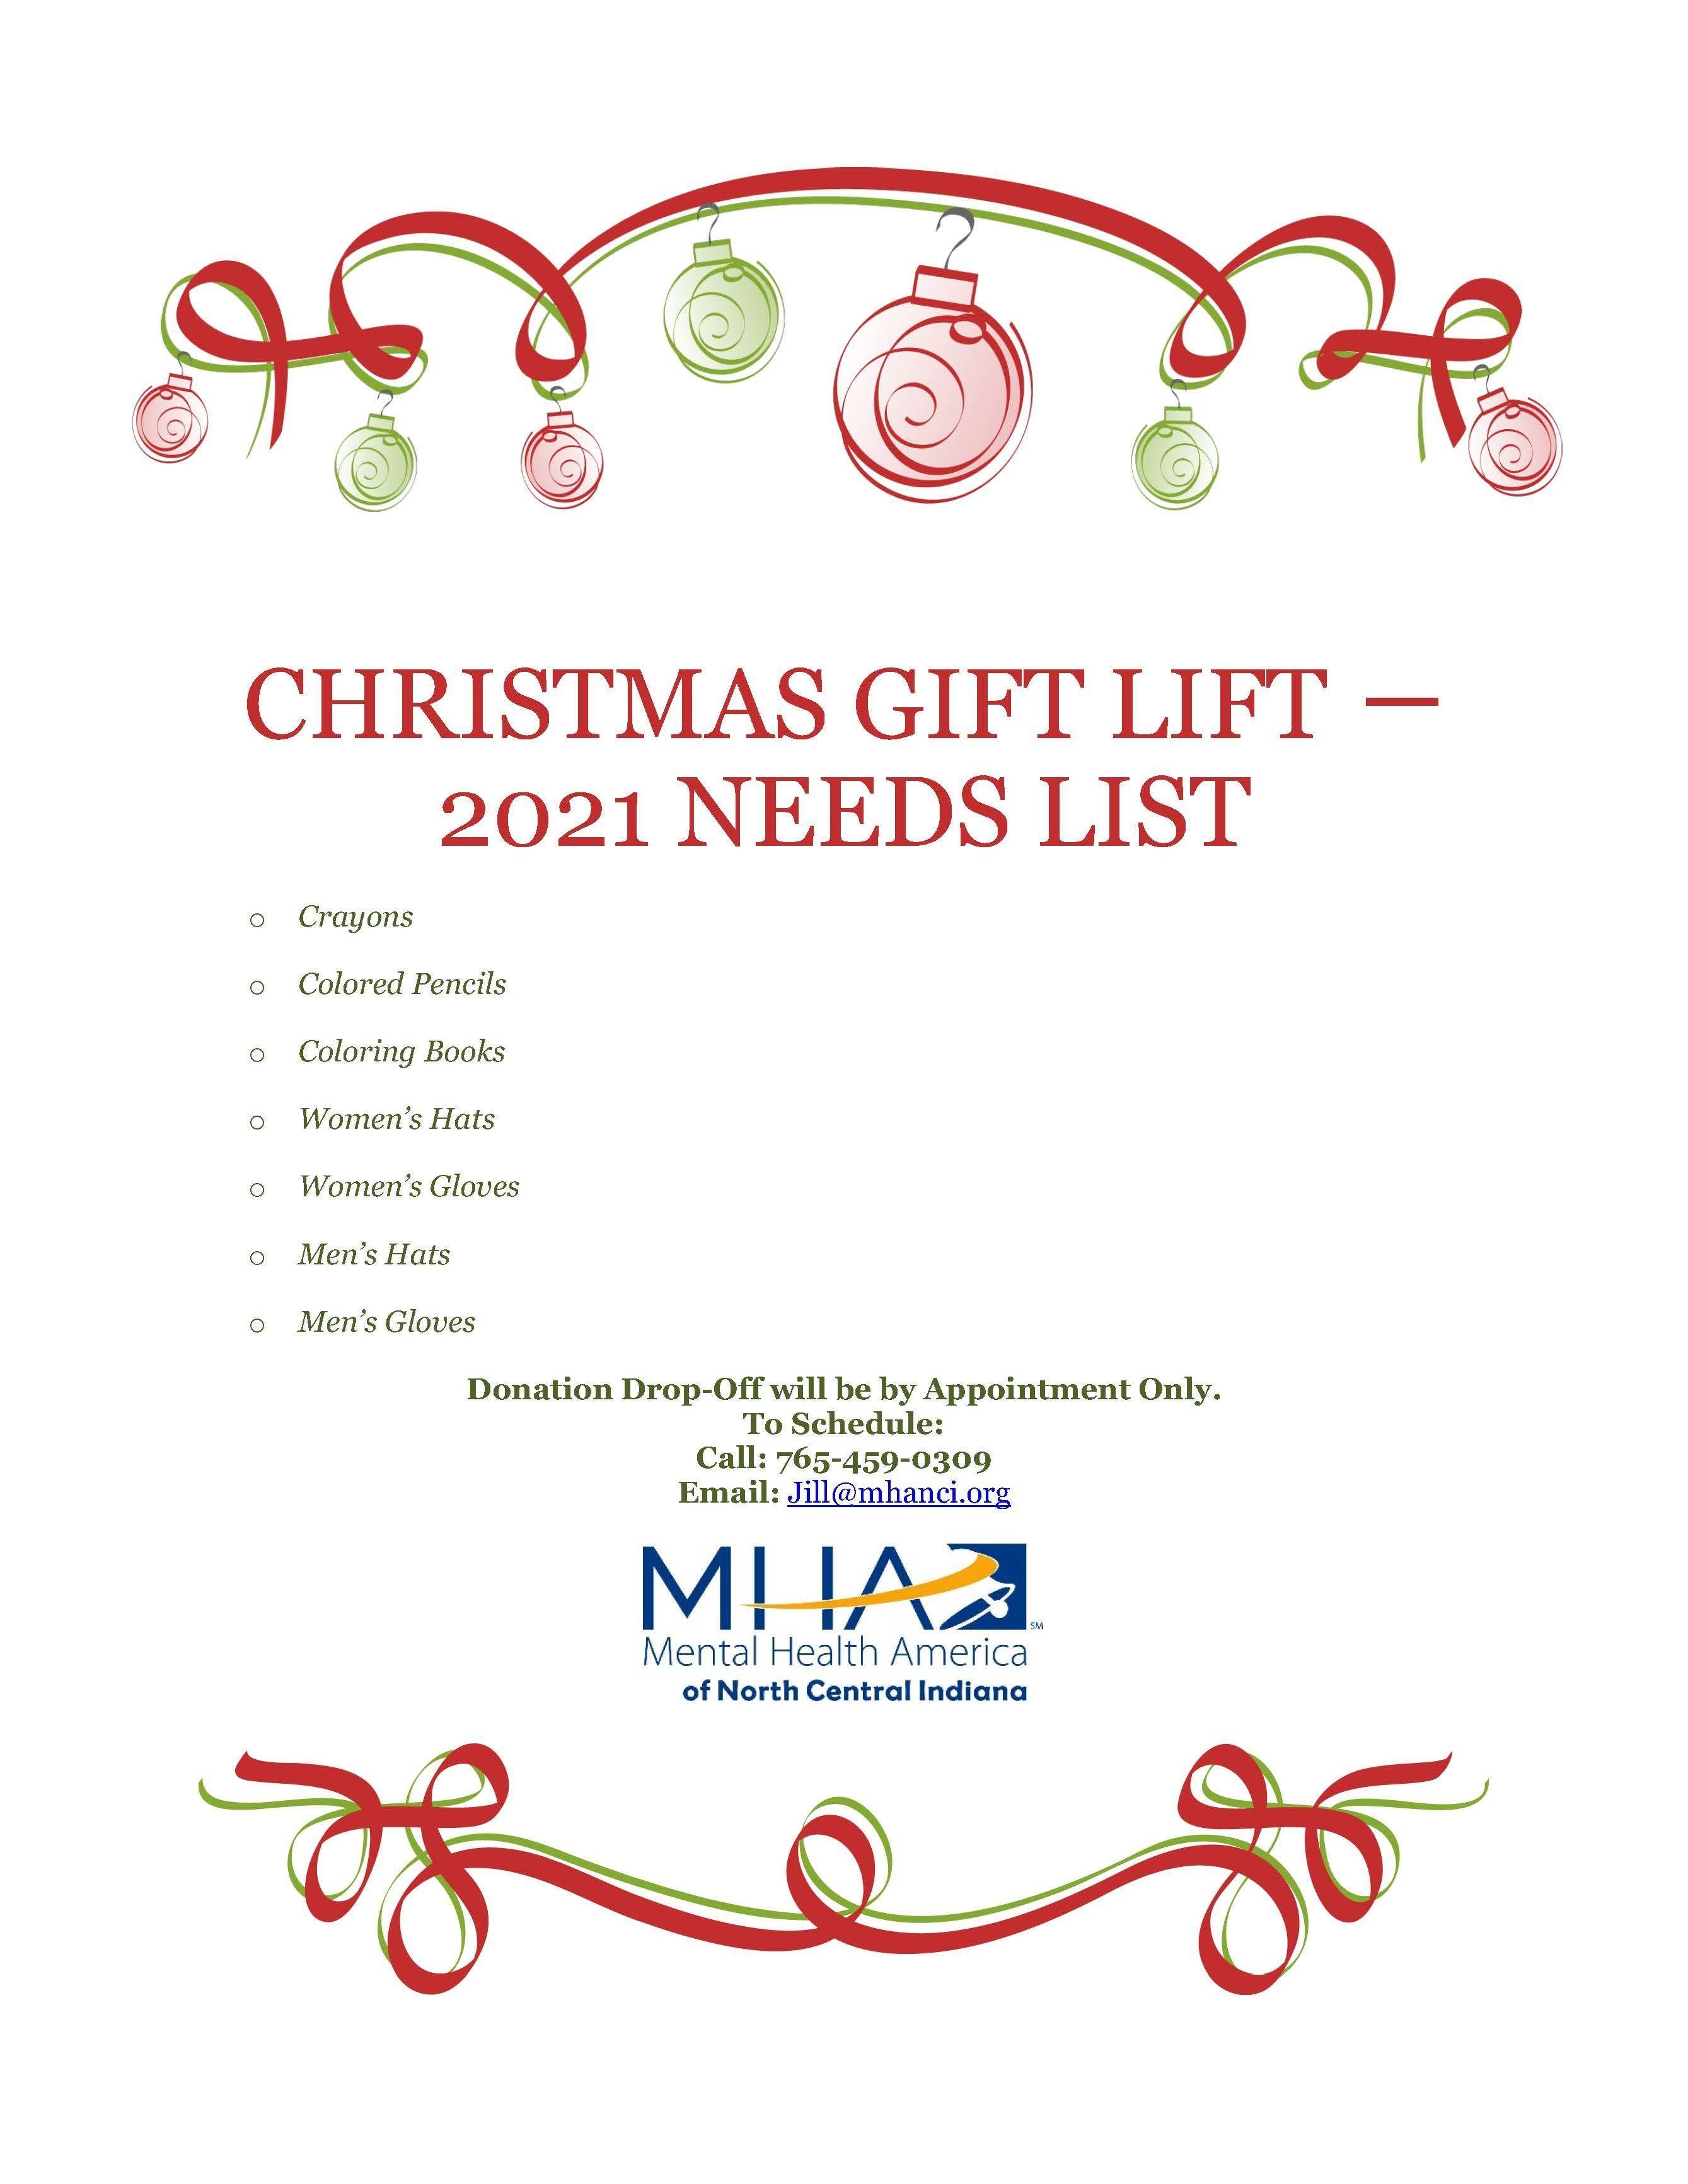 Gift Lift - NEEDS LIST - 2021